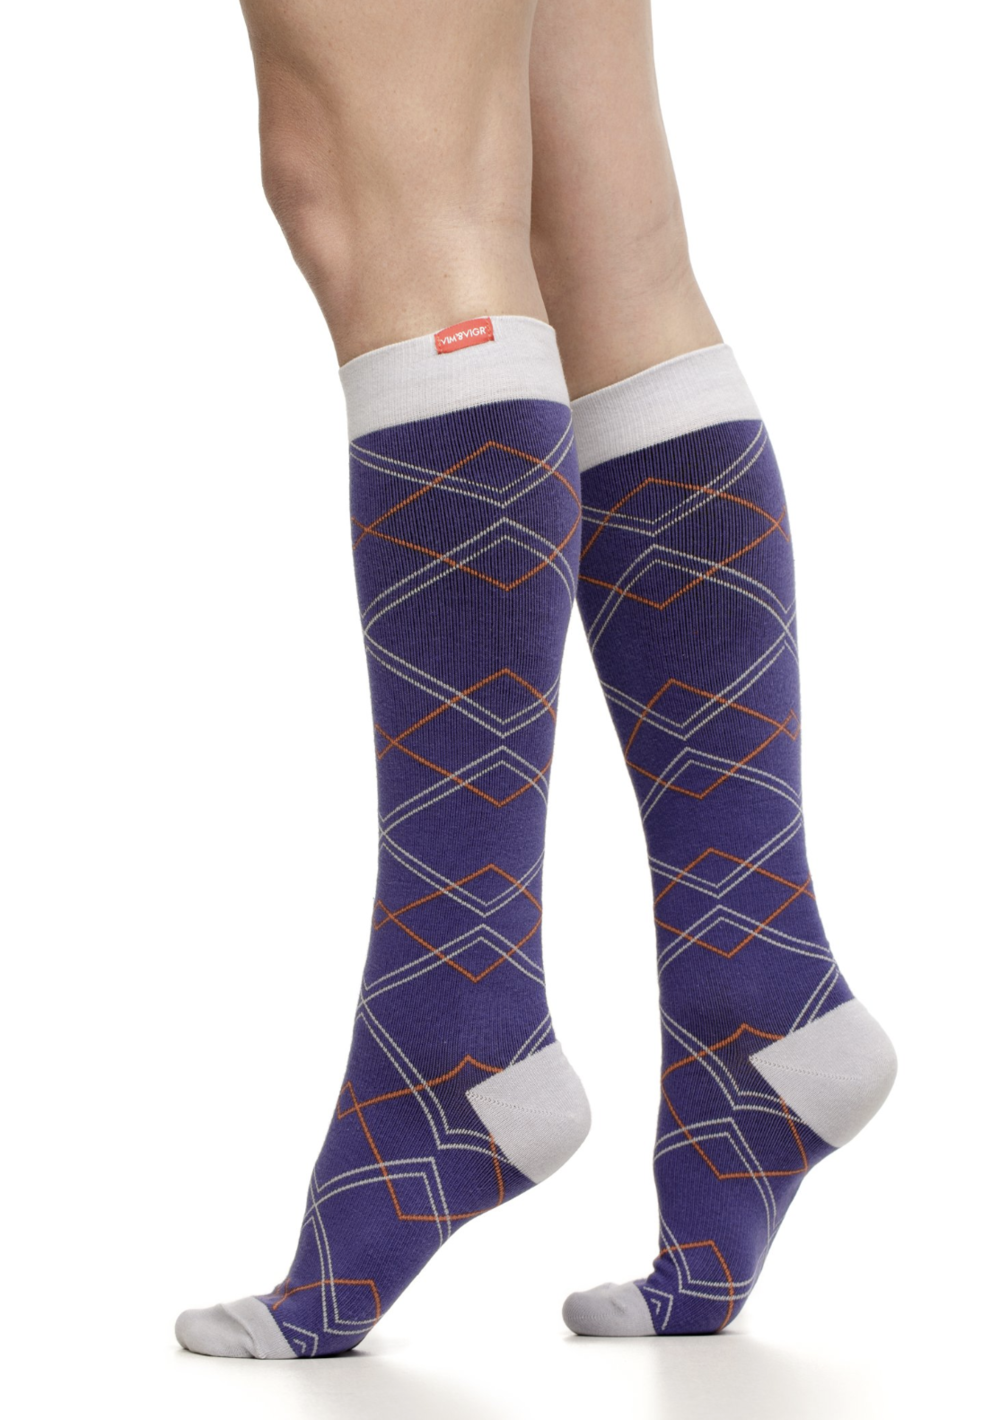 Compression Socks from Vim & Vigr